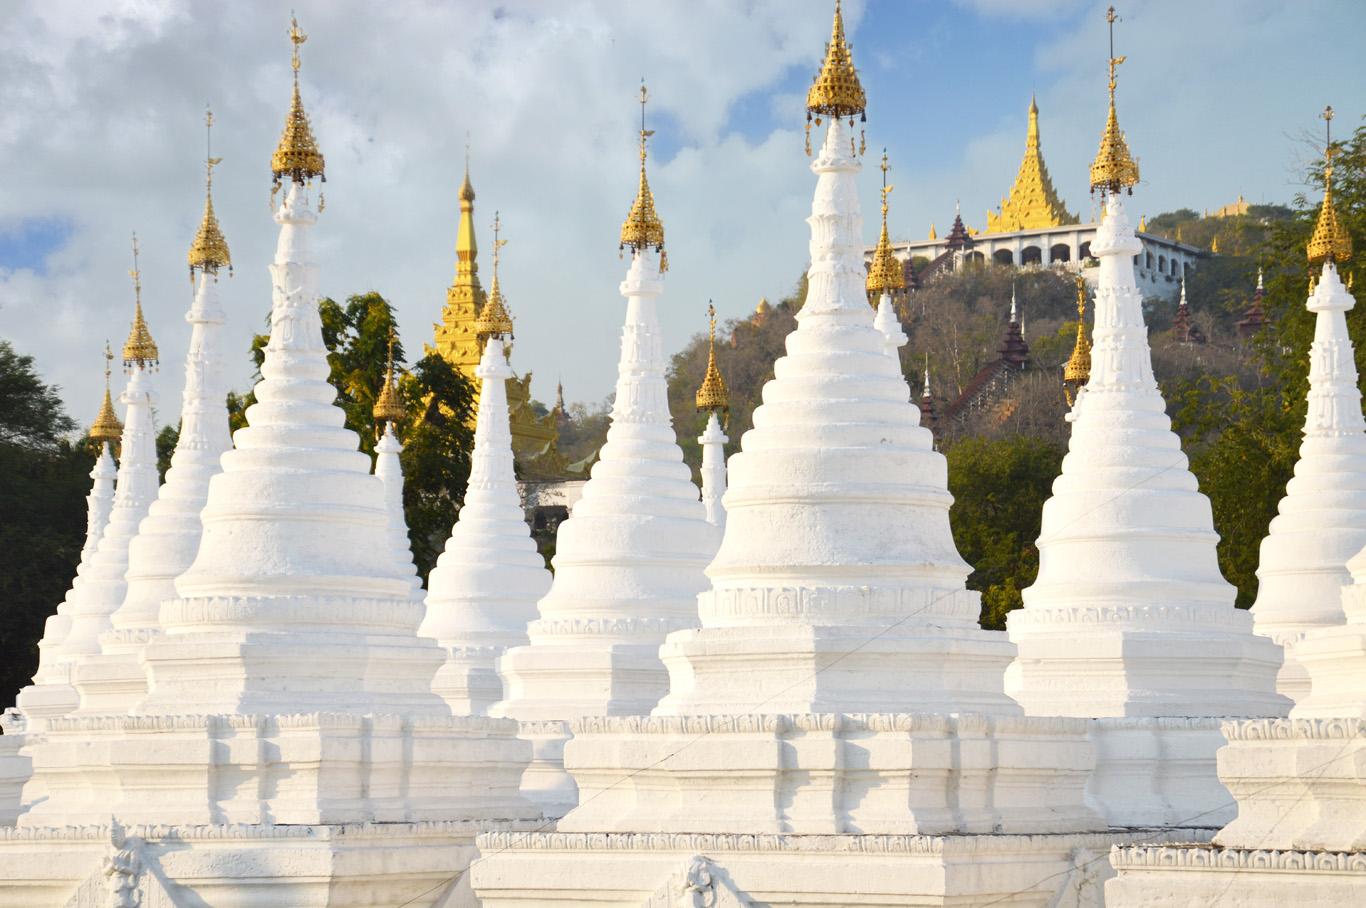 White stupas of Sandamuni Pagoda - Mandalay Hill in the back